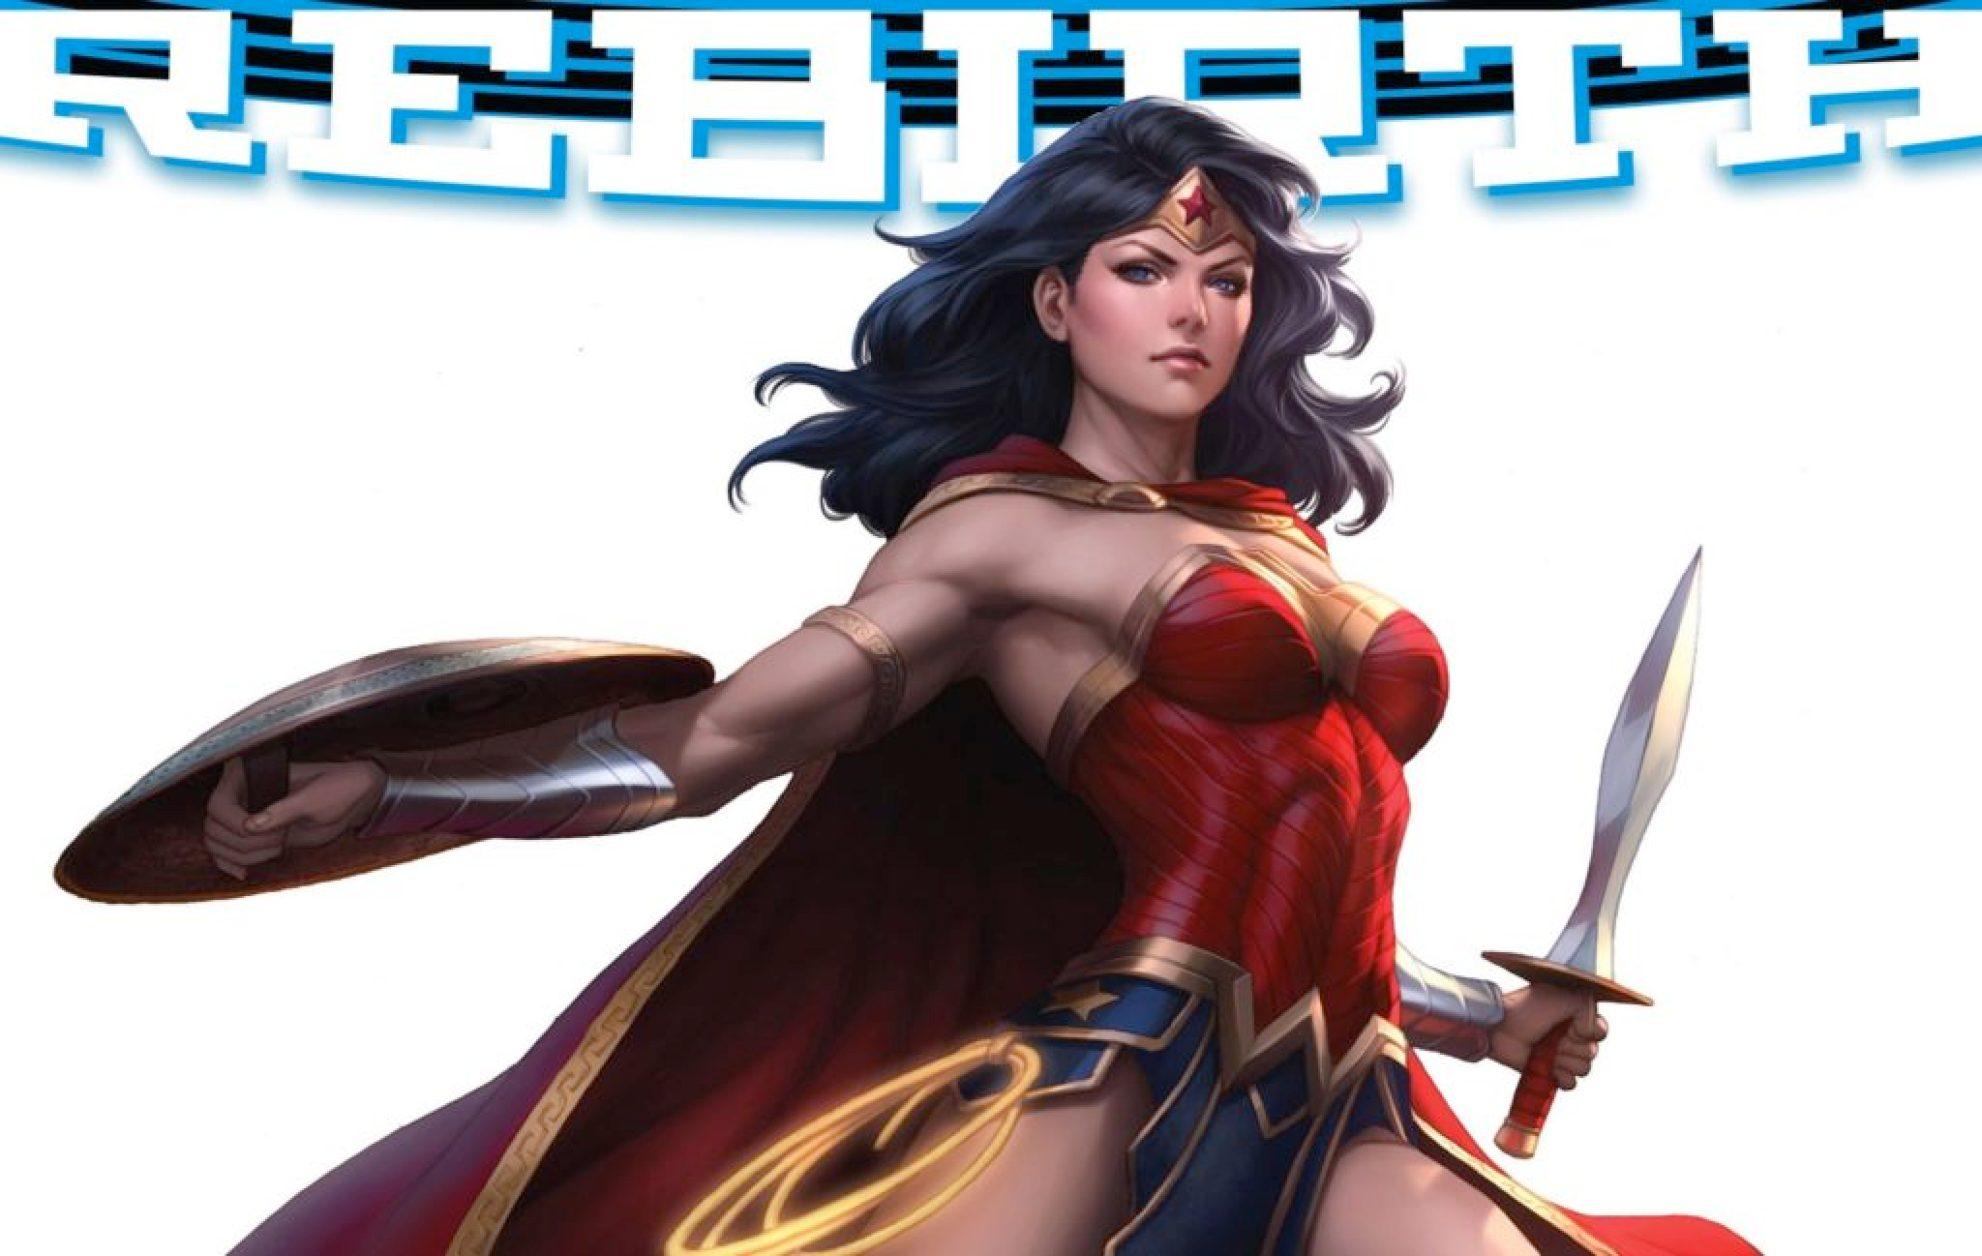 Wonder Woman Rebirth #1 from DC Comics